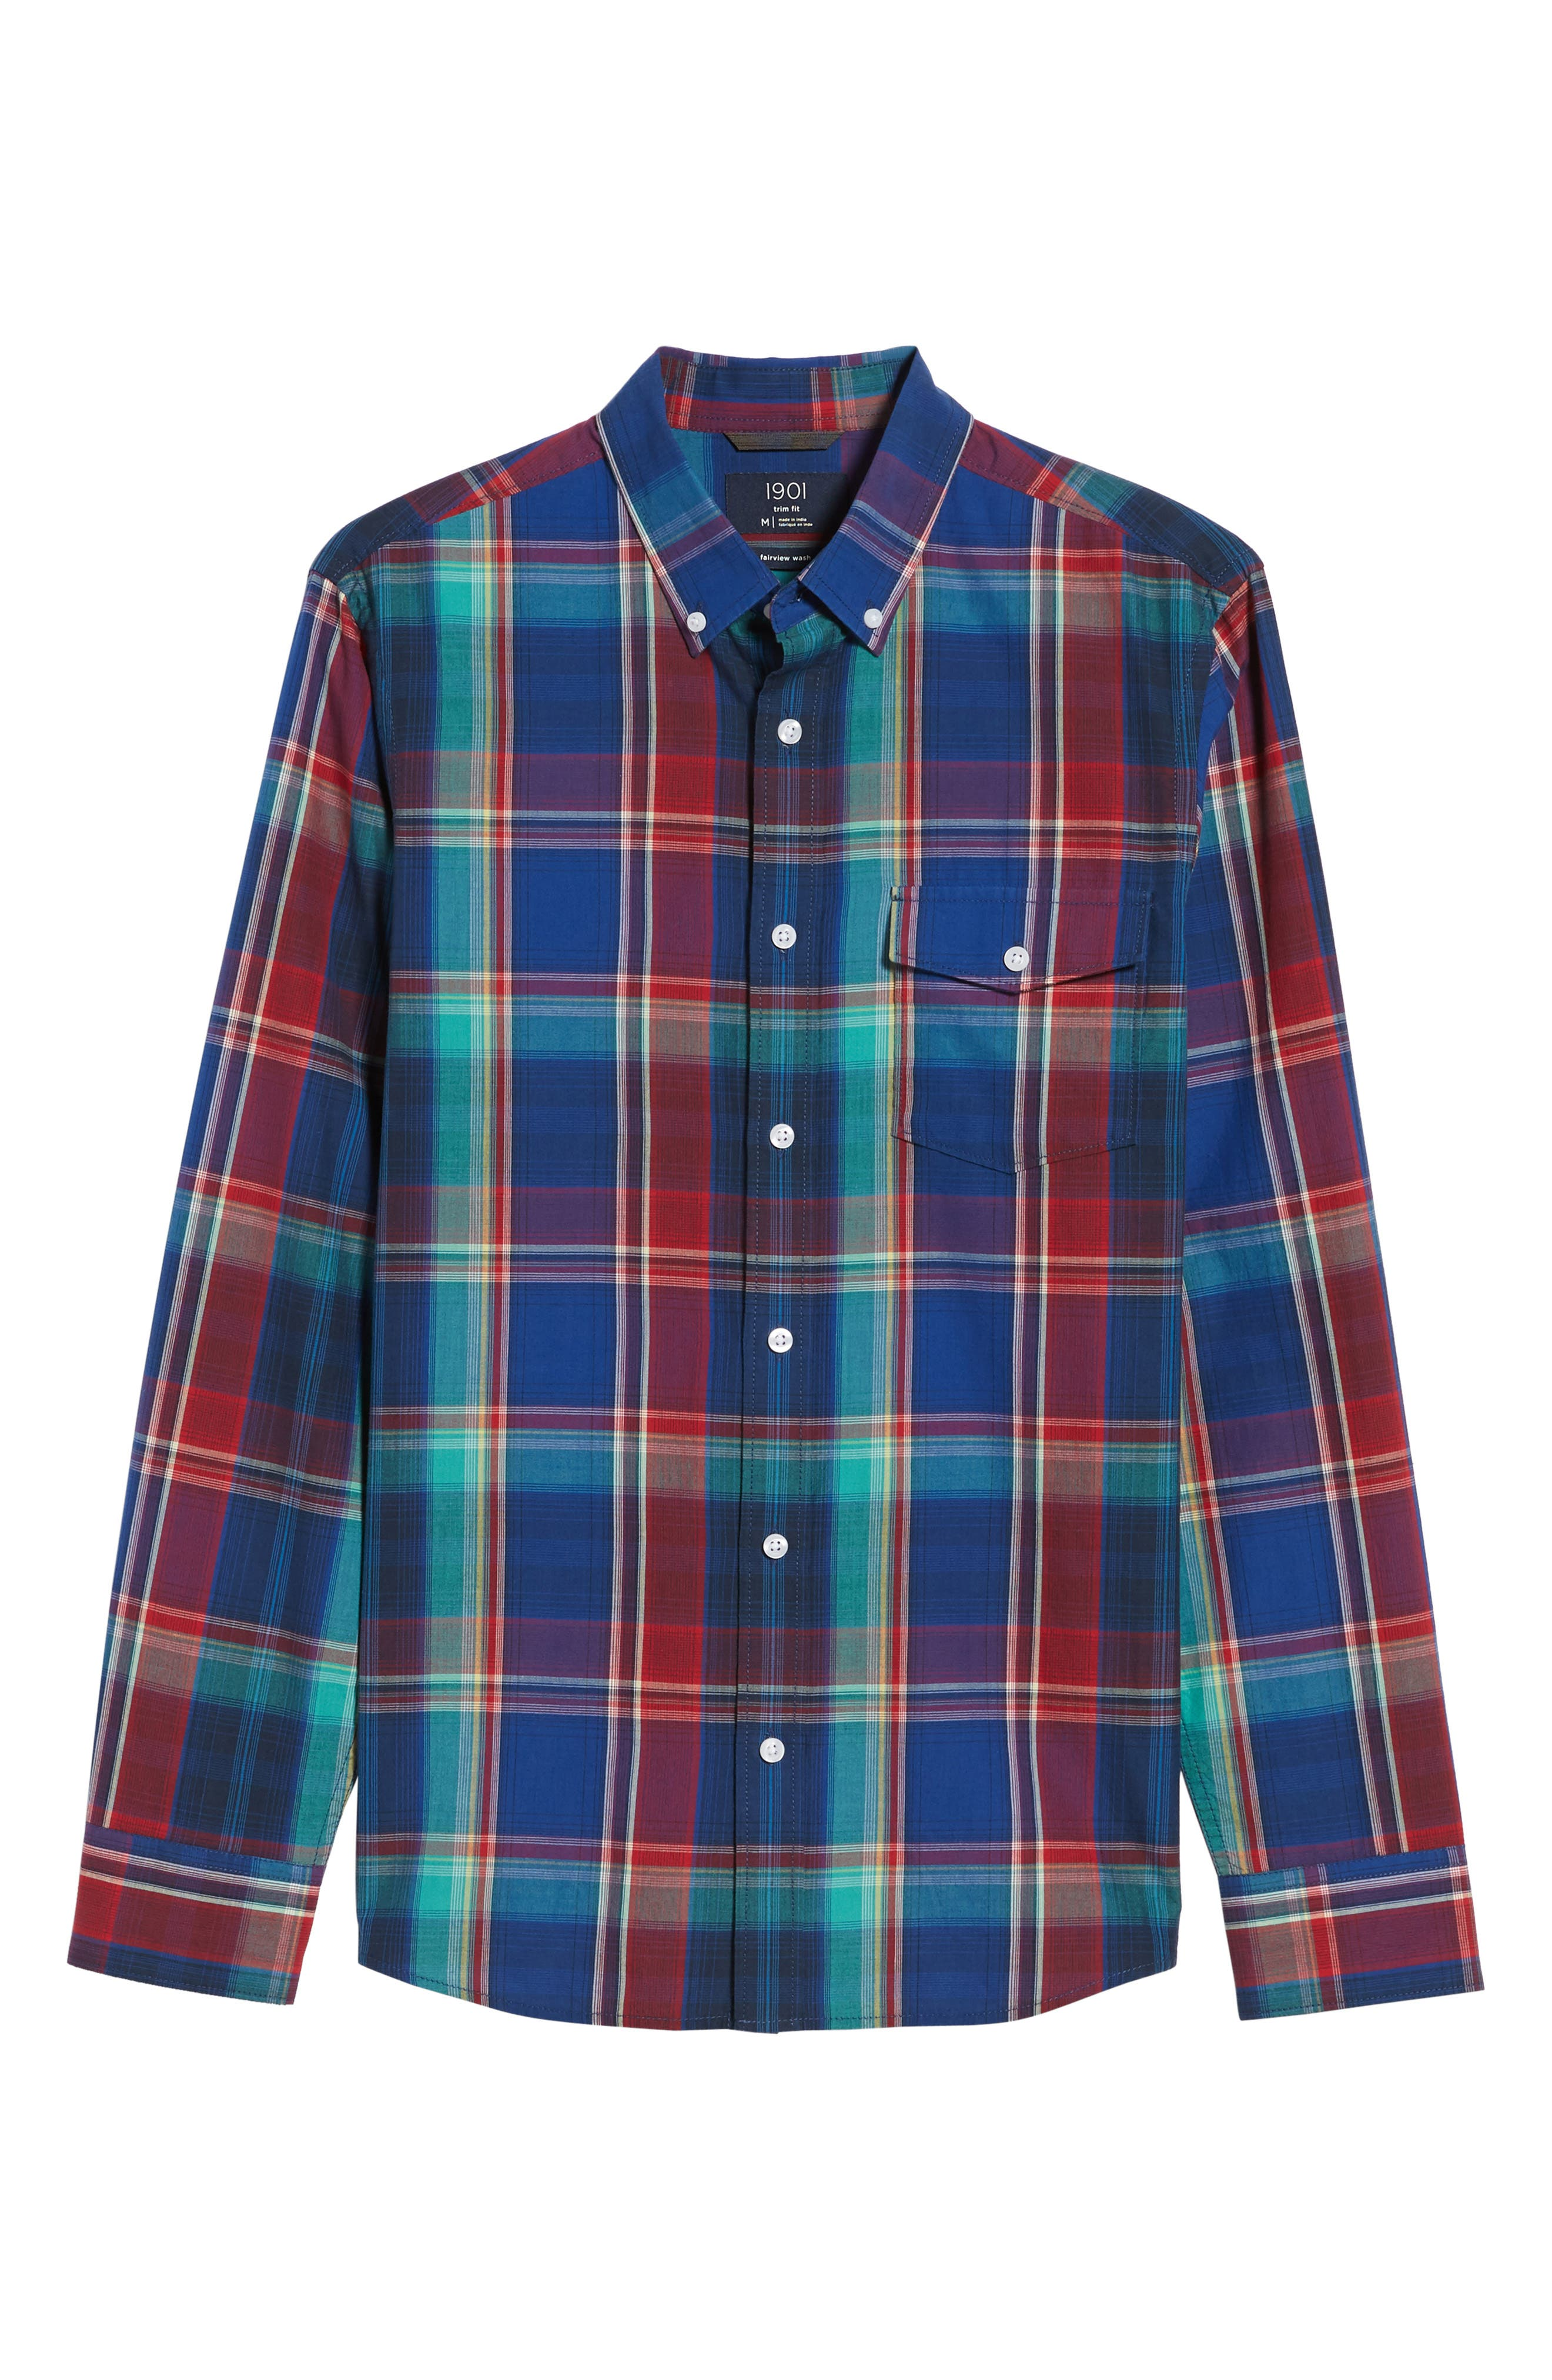 Ivy Trim Fit Madras Plaid Sport Shirt,                             Alternate thumbnail 6, color,                             Navy Red Fine Line Plaid